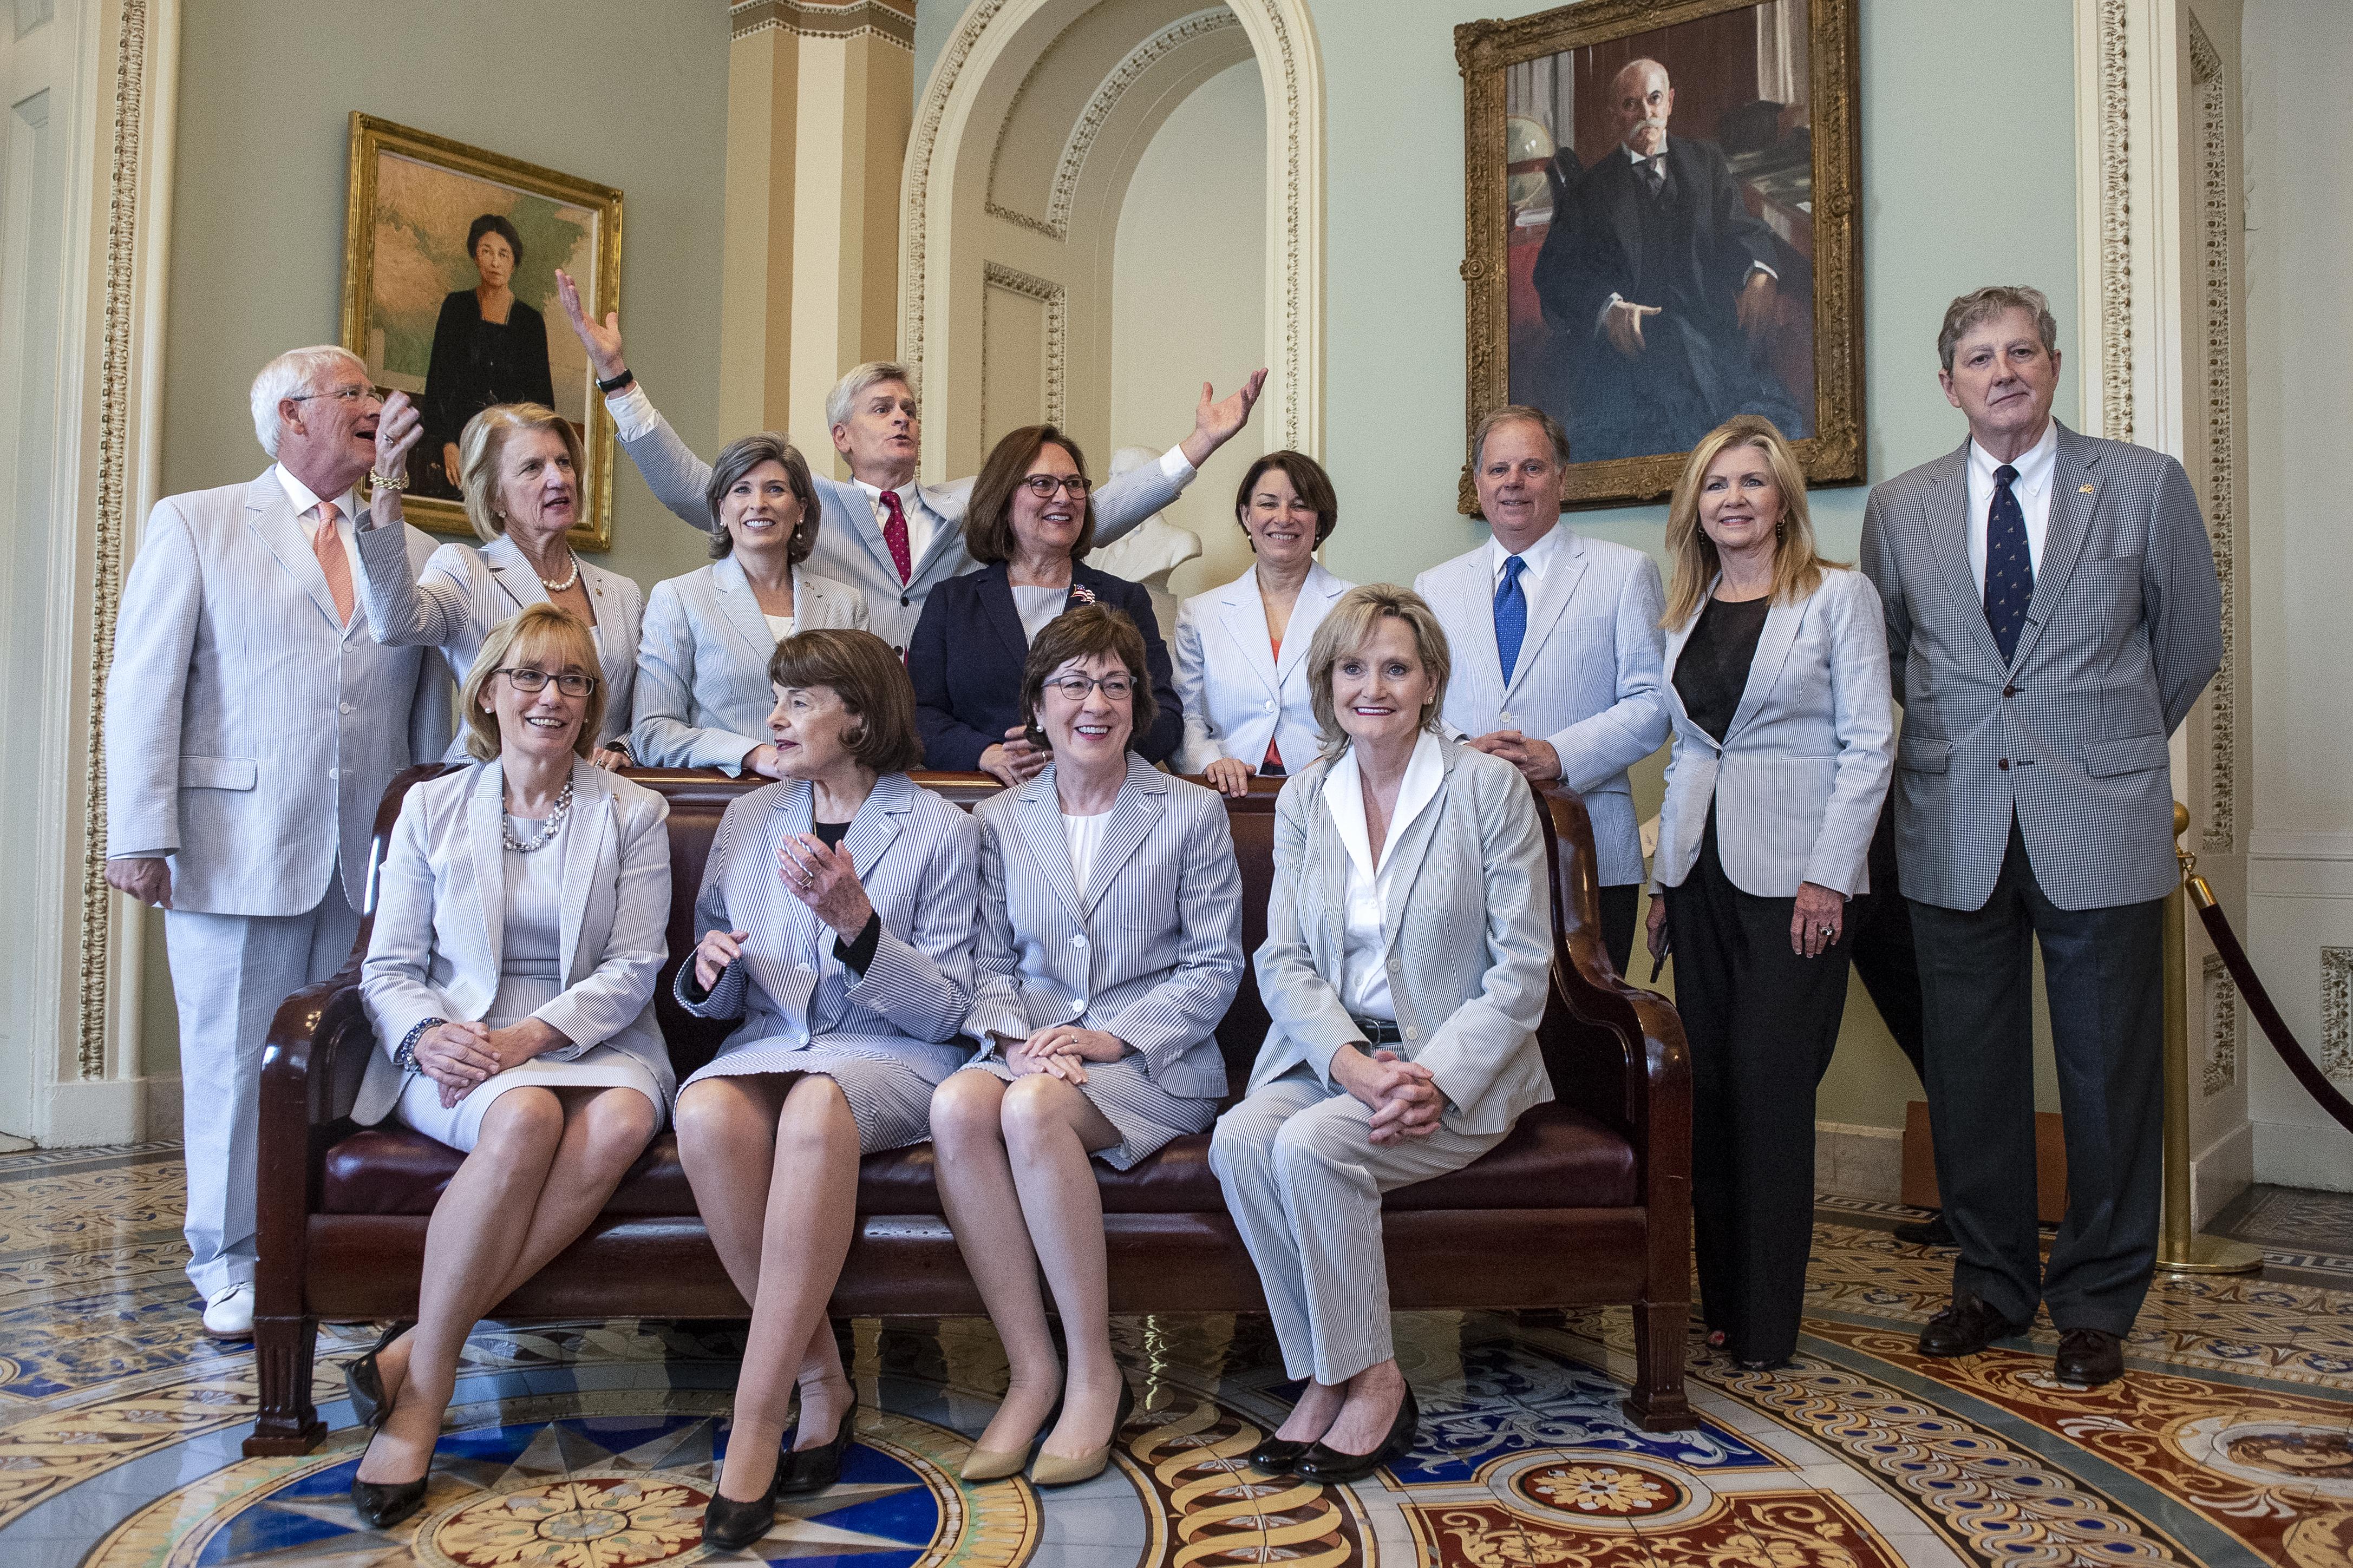 UNITED STATES - JUNE 13: Sen. Maggie Hassan, D-N.H., front left, Sen. Dianne Feinstein, D-Calf., Sen. Susan Collins, R-Maine, Sen. Cindy Hyde-Smith, R-Miss., Sen. Roger Wicker, R-Miss., back left, Sen. Shelley Moore Capito, R-W.Va., Sen. Joni Ernst, R-Iowa, Sen. Bill Cassidy, R-La., Sen. Deb Fischer, R-Neb., Sen. Amy Klobuchar, D-Minn., Sen. Doug Jones, D-Ala., R-N.C., Sen. Marsha Blackburn, R-Tenn., and Sen. John Kennedy, R-La., come together to celebrate National Seersucker Day in Washington on Thursday June 13, 2019. (Photo by Caroline Brehman/CQ Roll Call)